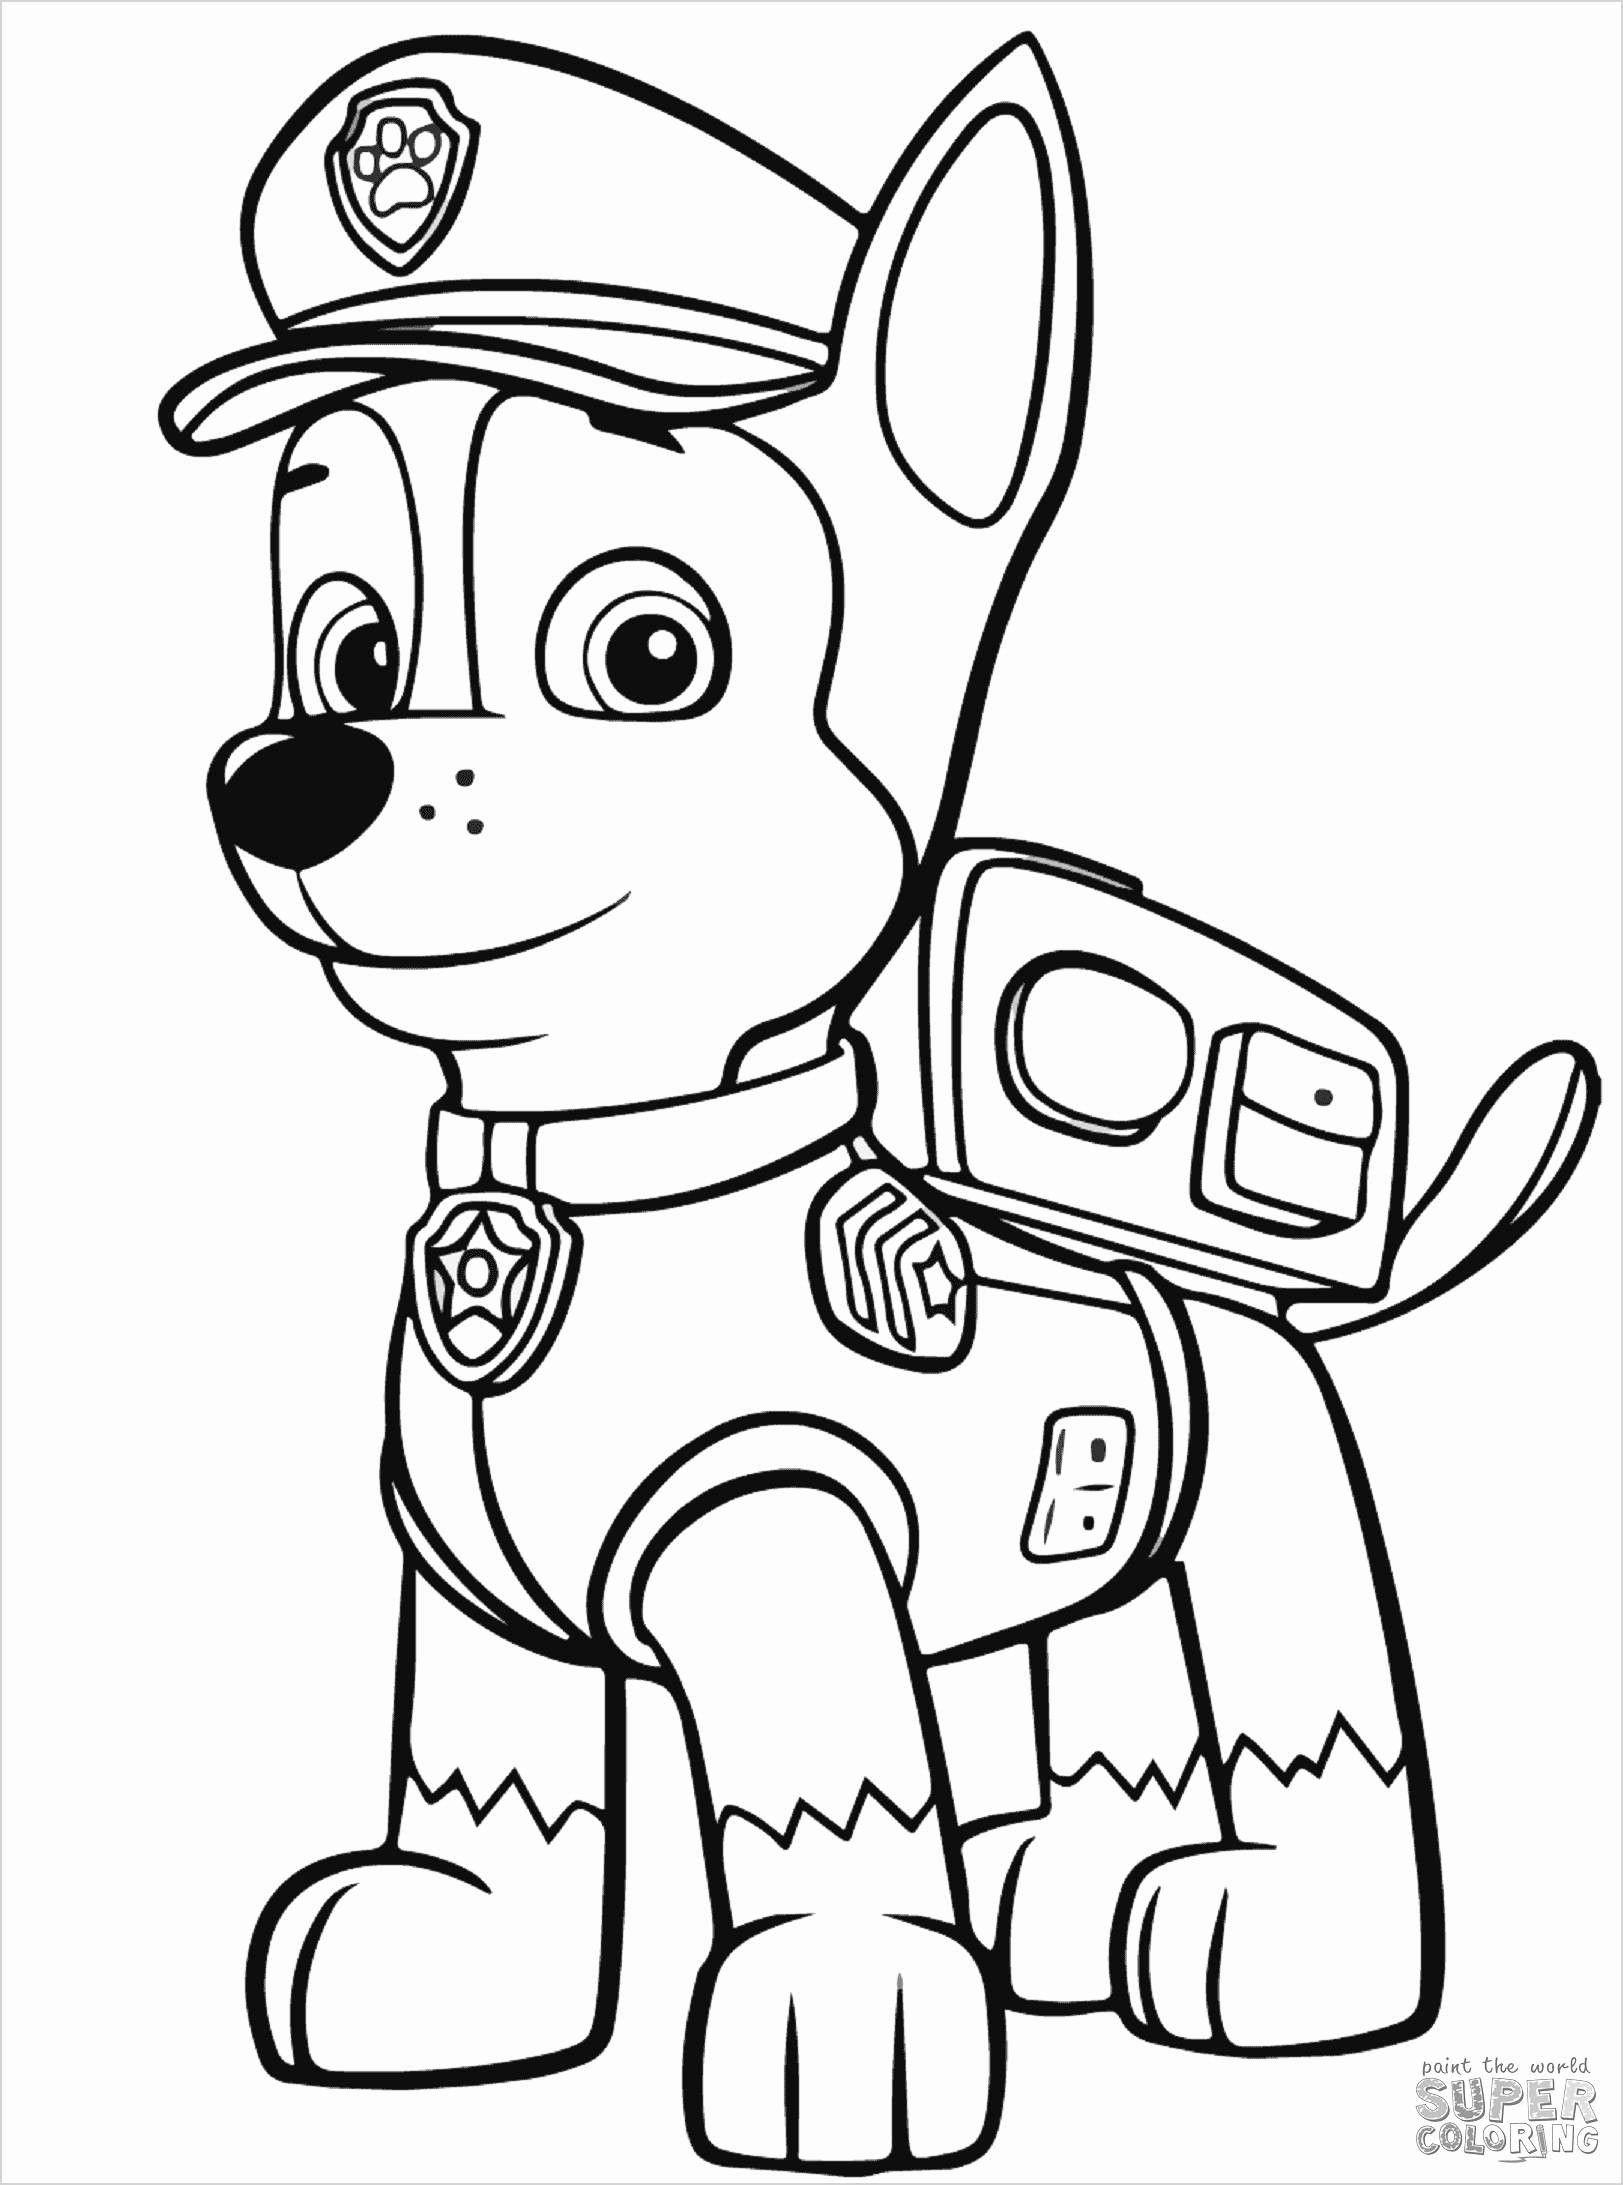 Paw Patrol Coloring Book Inspirational Coloring Pages Pawatrol Coloring Bookages Torint Ele In 2020 Paw Patrol Coloring Pages Paw Patrol Coloring Paw Patrol Printables